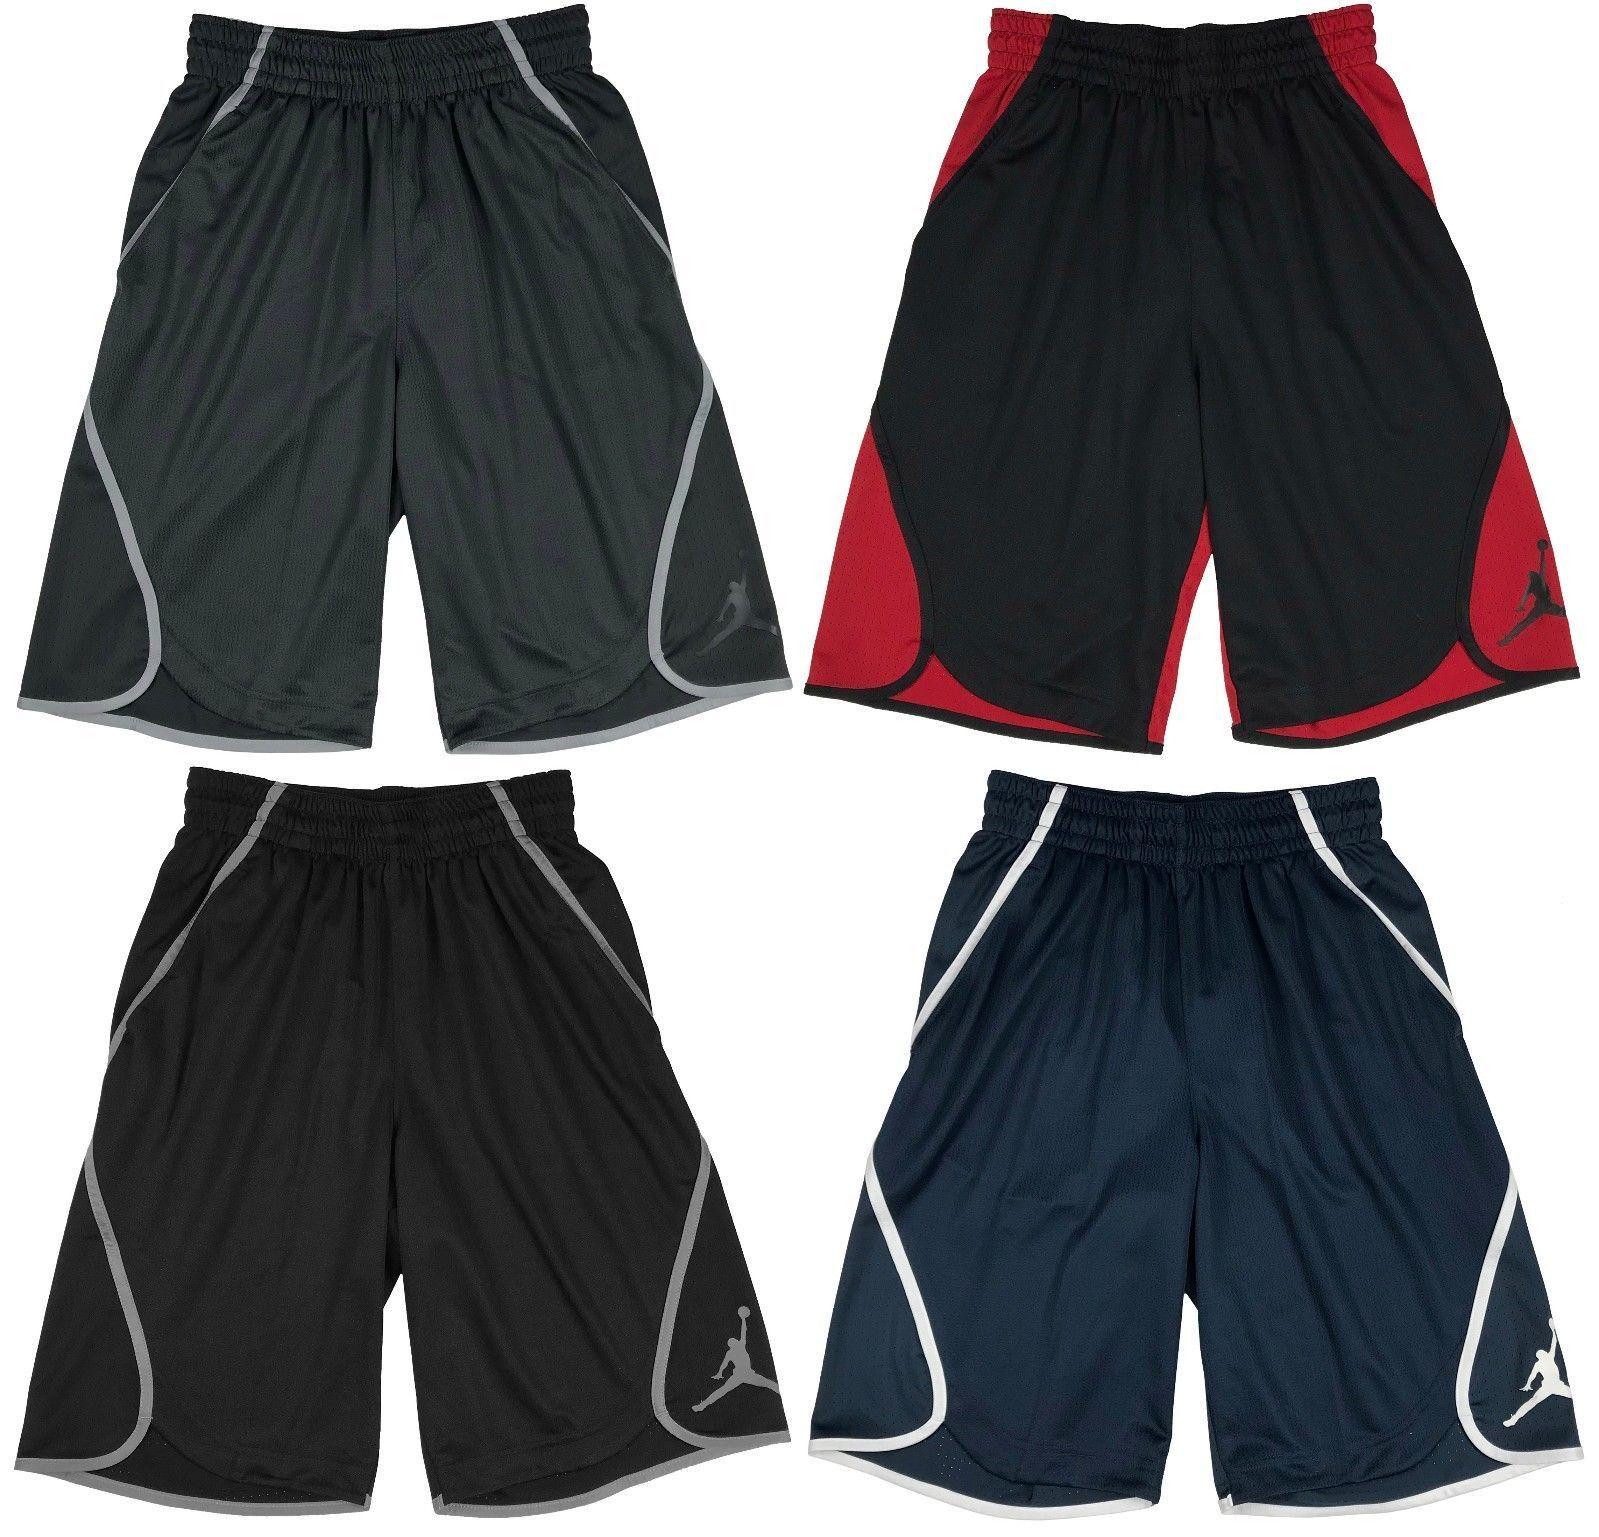 a75b7717f7ed63 Nike Air Jordan Flight Victory Basketball Short Aa5581 464 Size Medium for  sale online